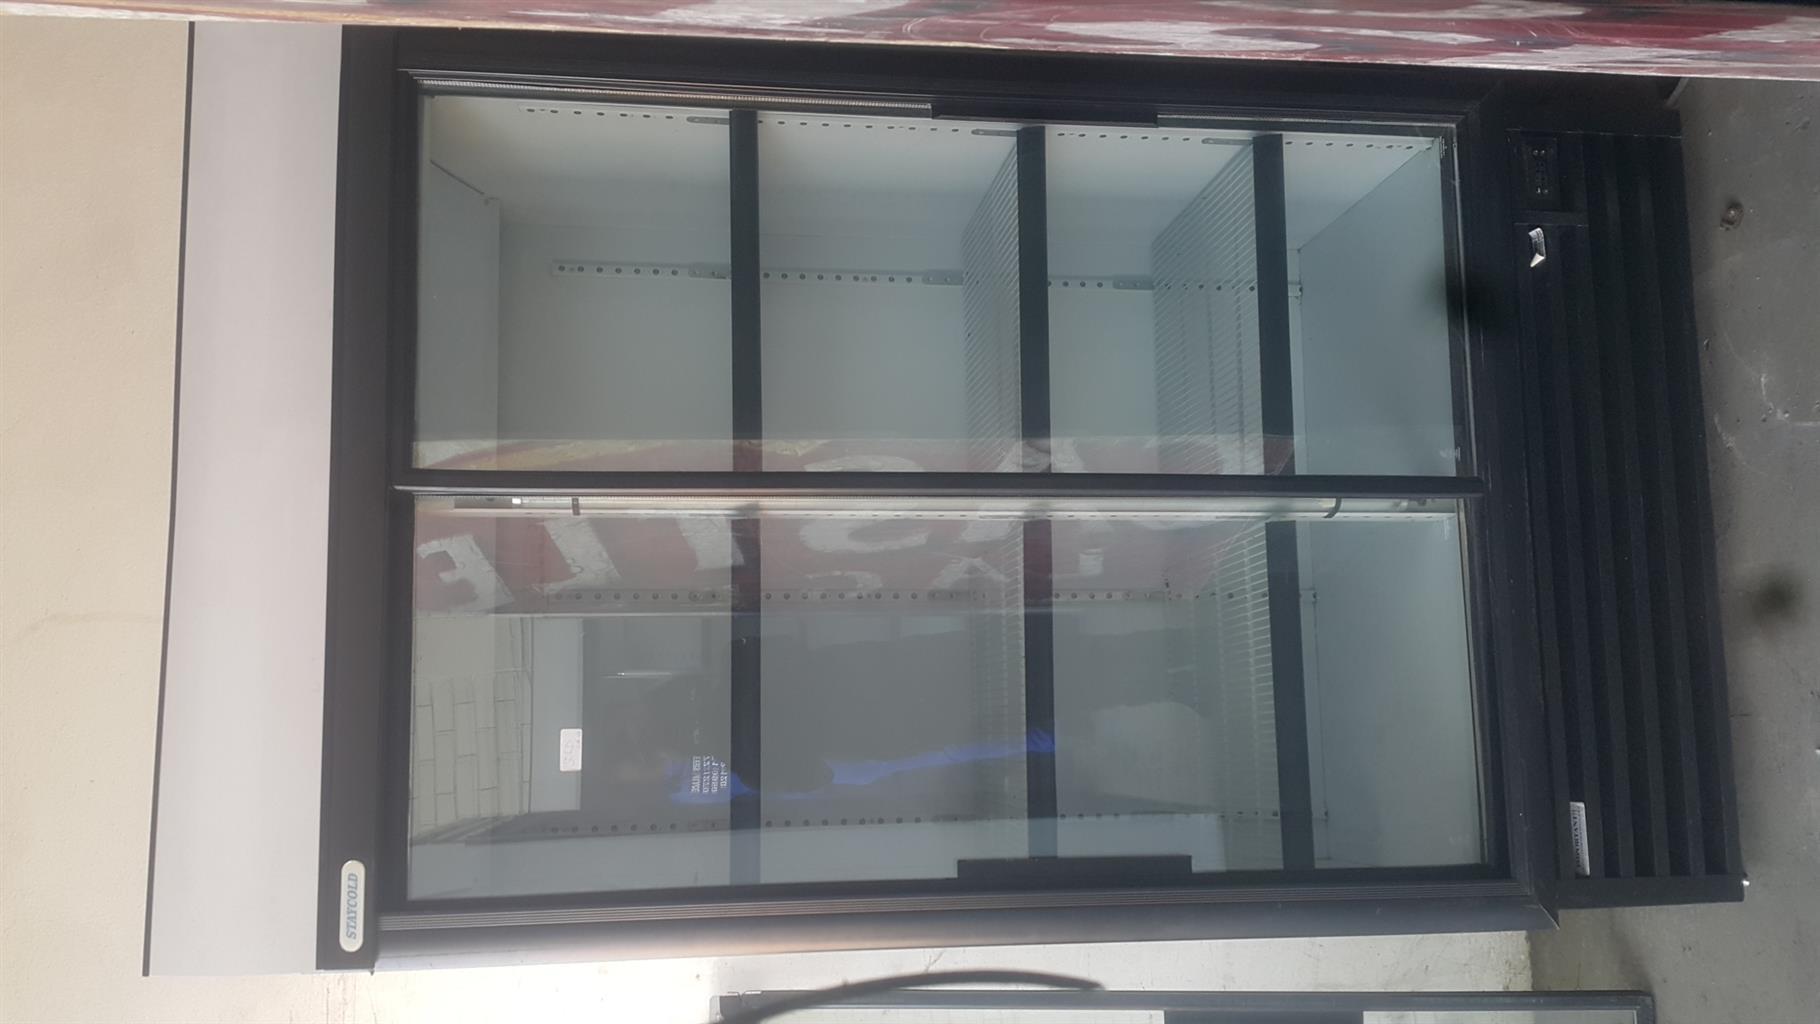 SD-1140 Display Upright Fridge + Two(2) months warranty